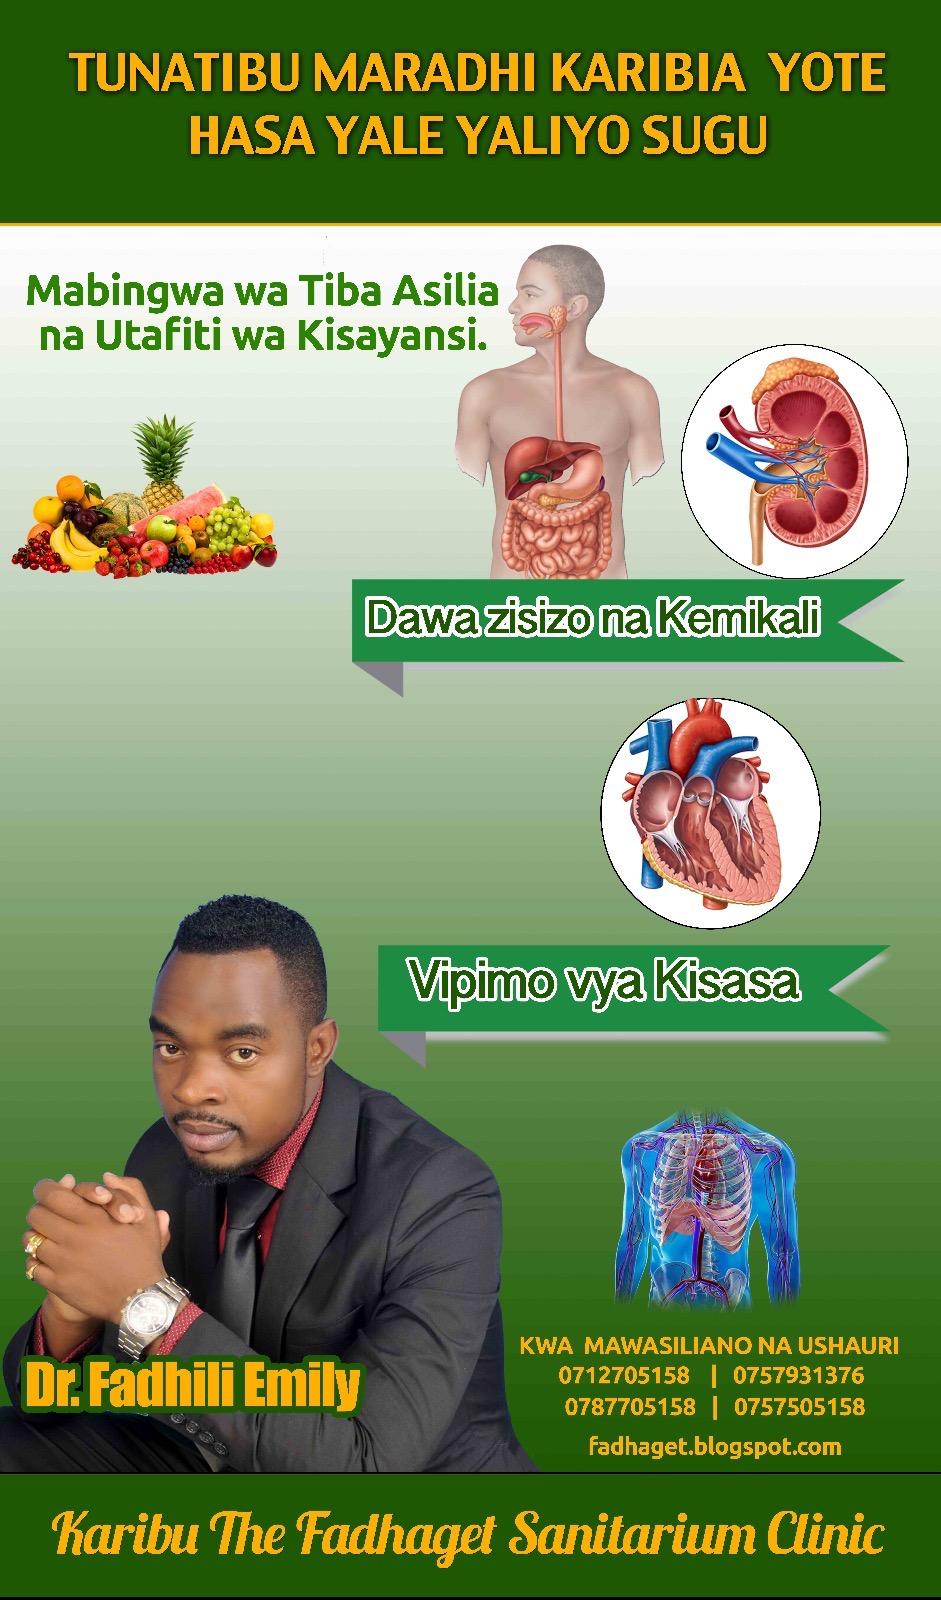 Karibu The Fadhaget Sanitarium Clinic kwa Huduma Bora